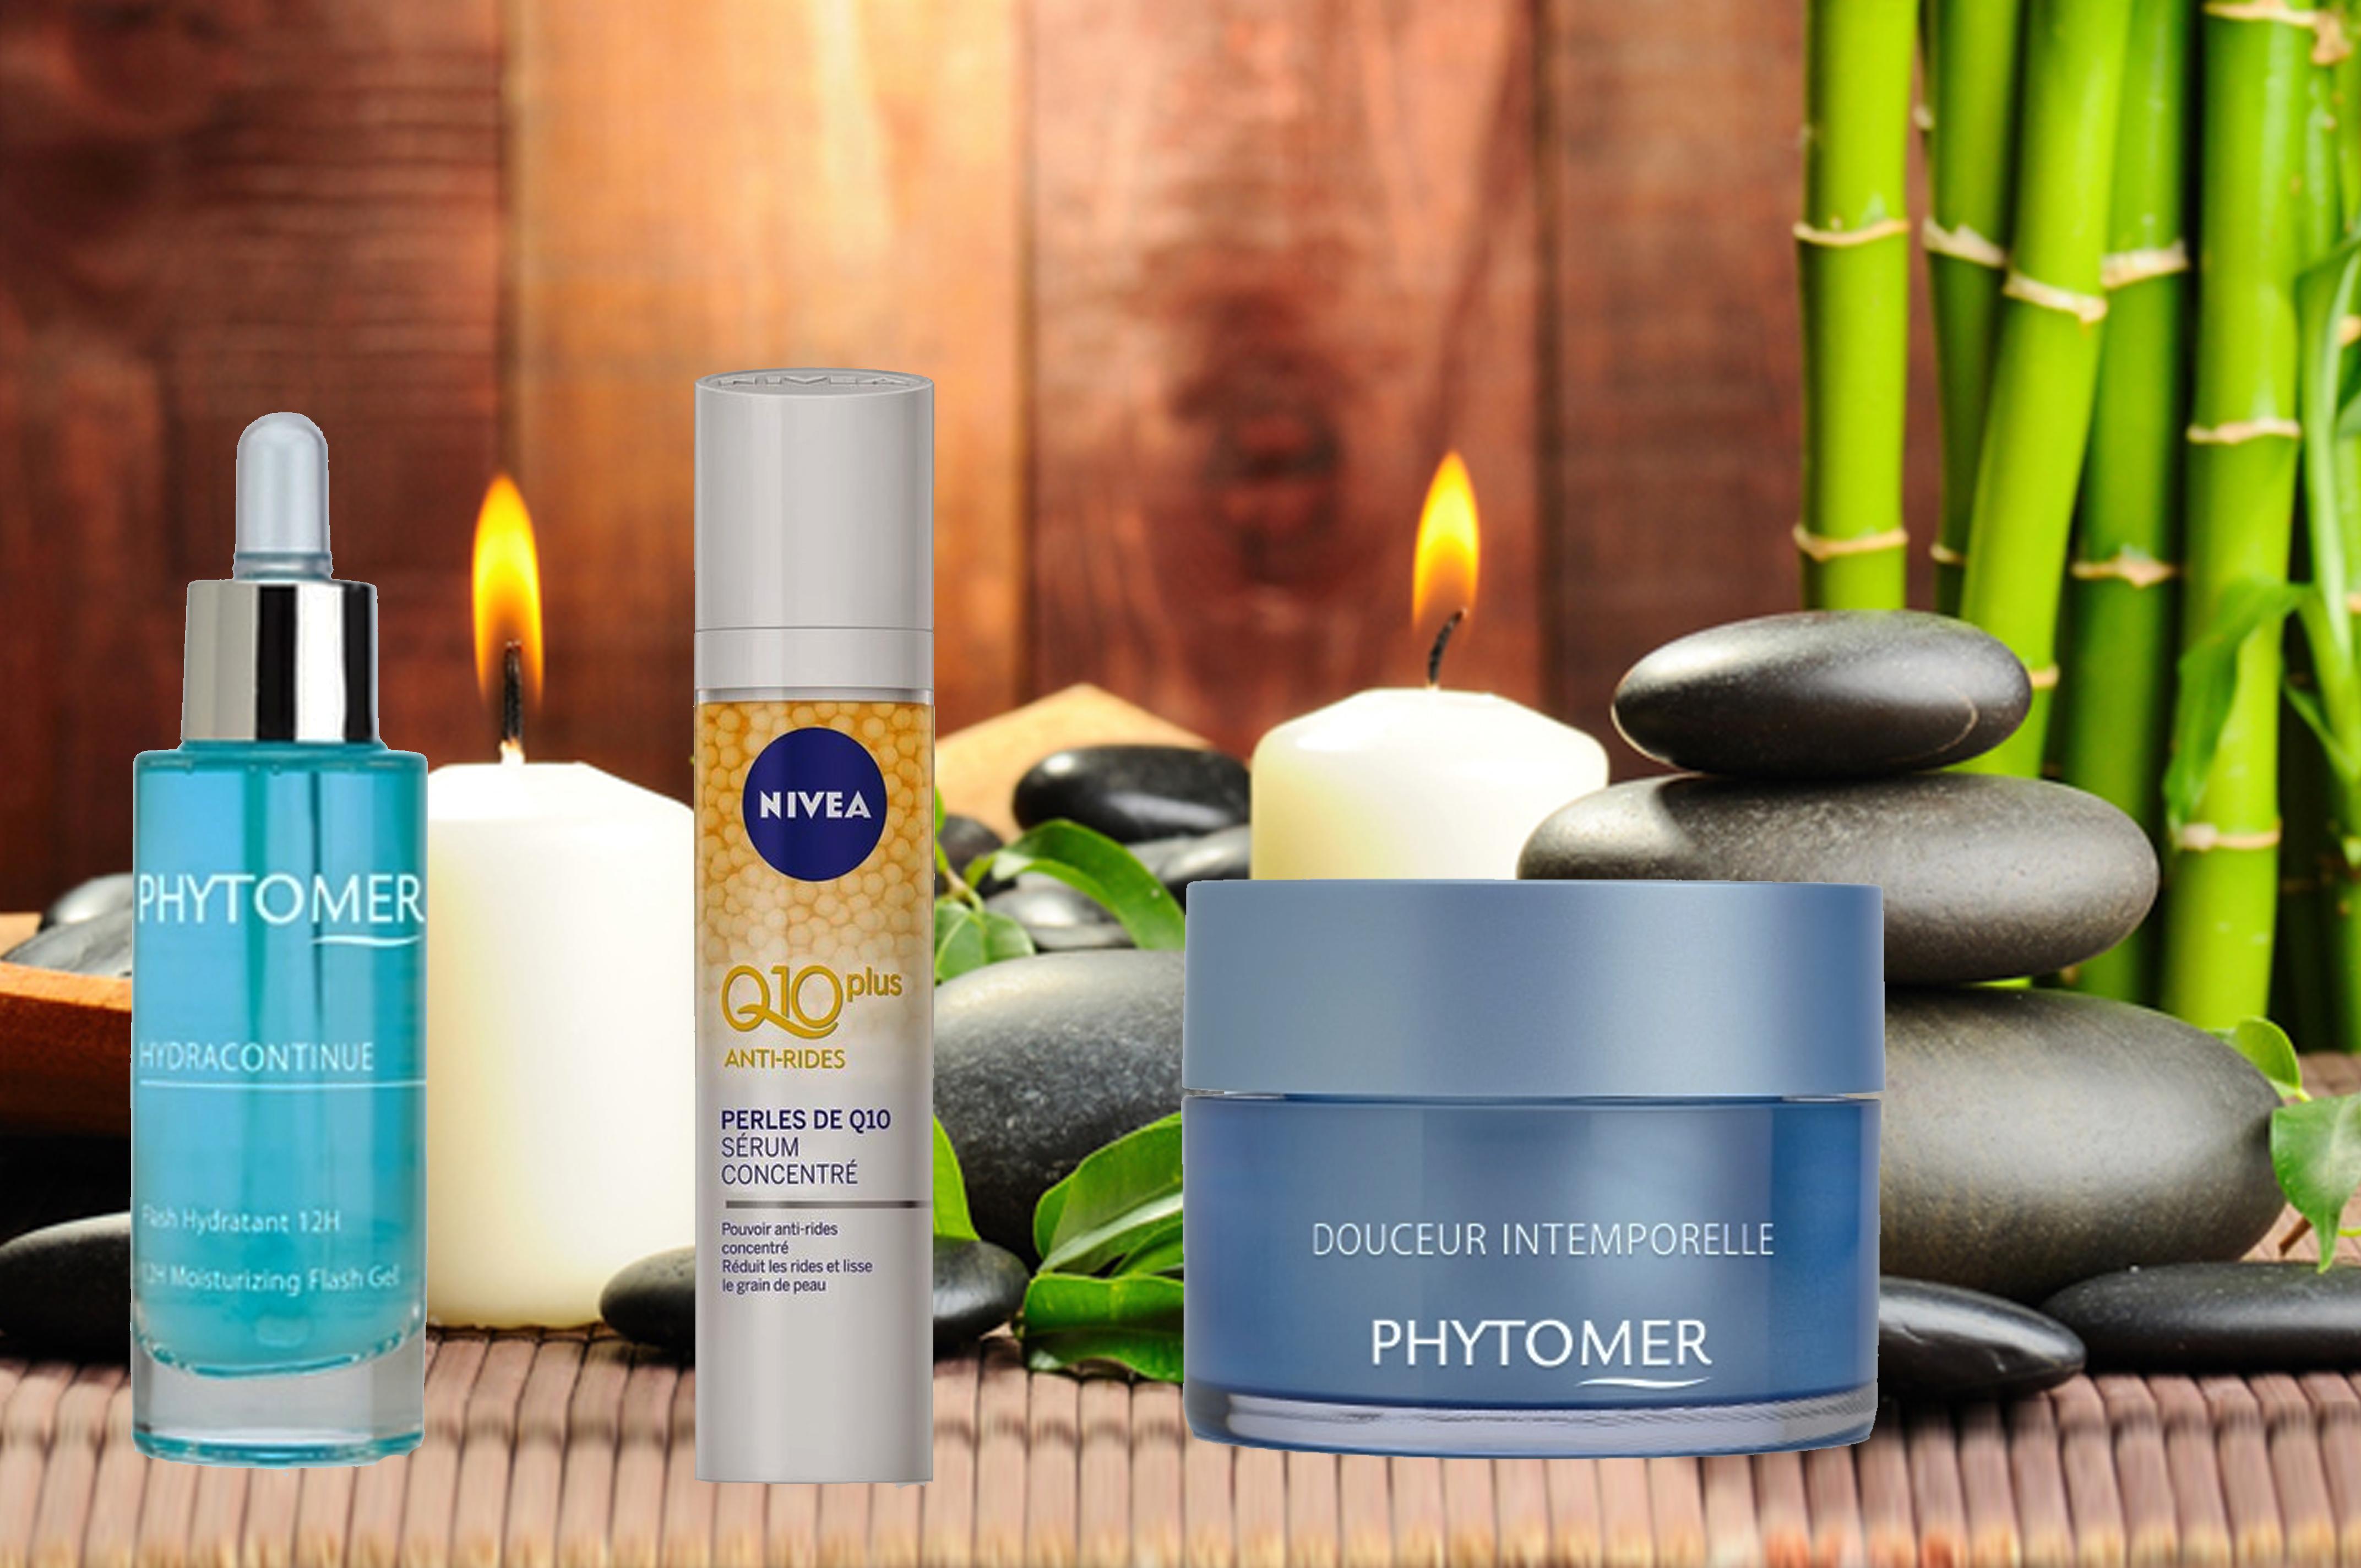 Routine soin hiver, Routine peau sèche, Nivea, Q10, Phytomer, Blog beauté